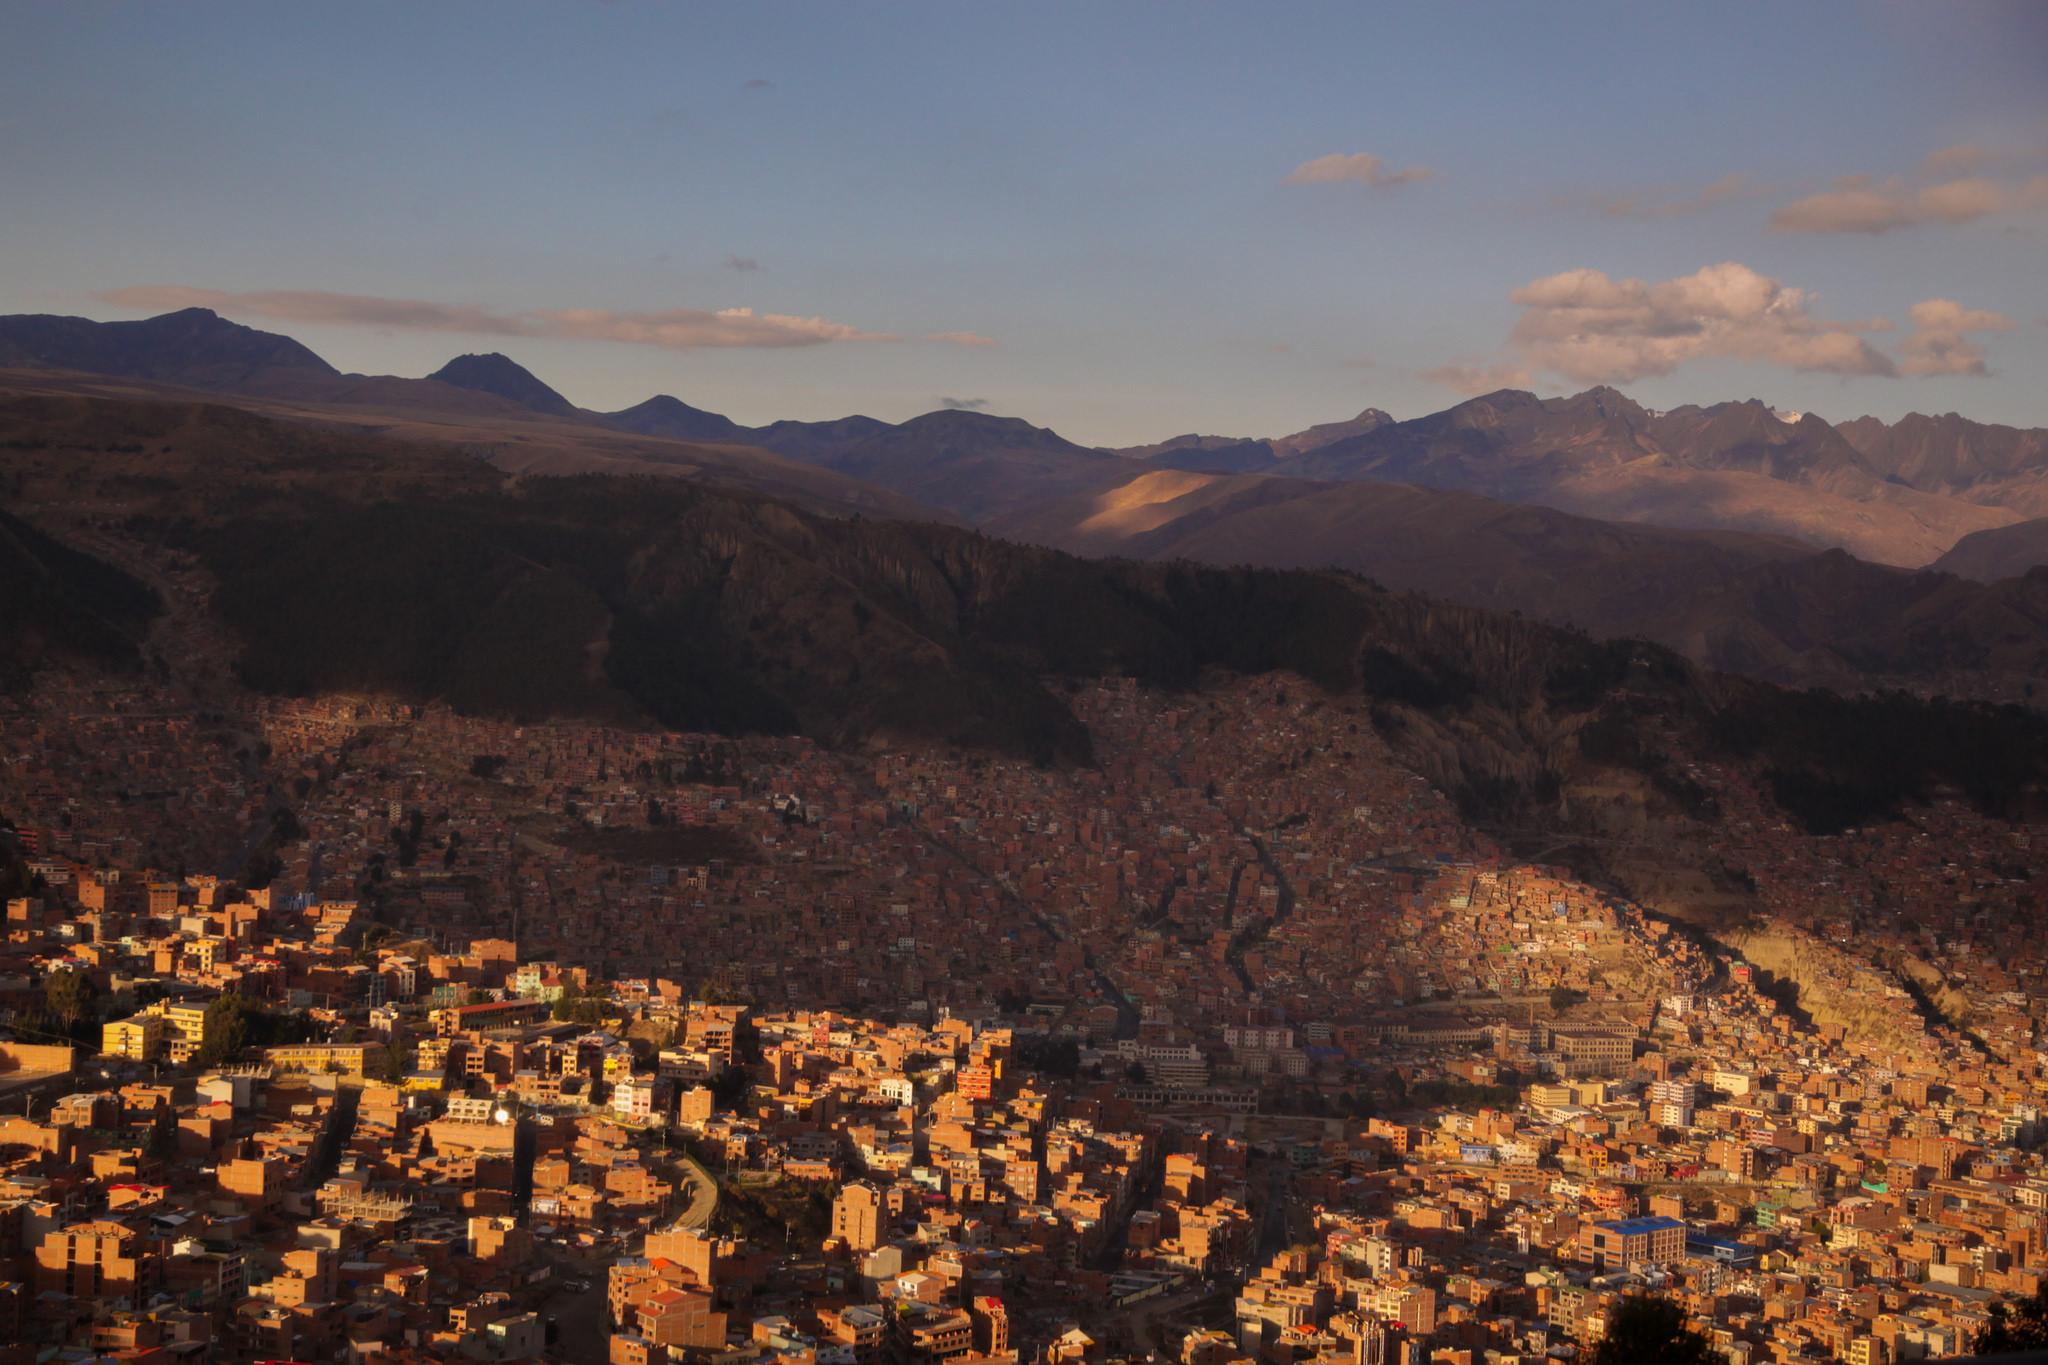 On the main road into La Paz